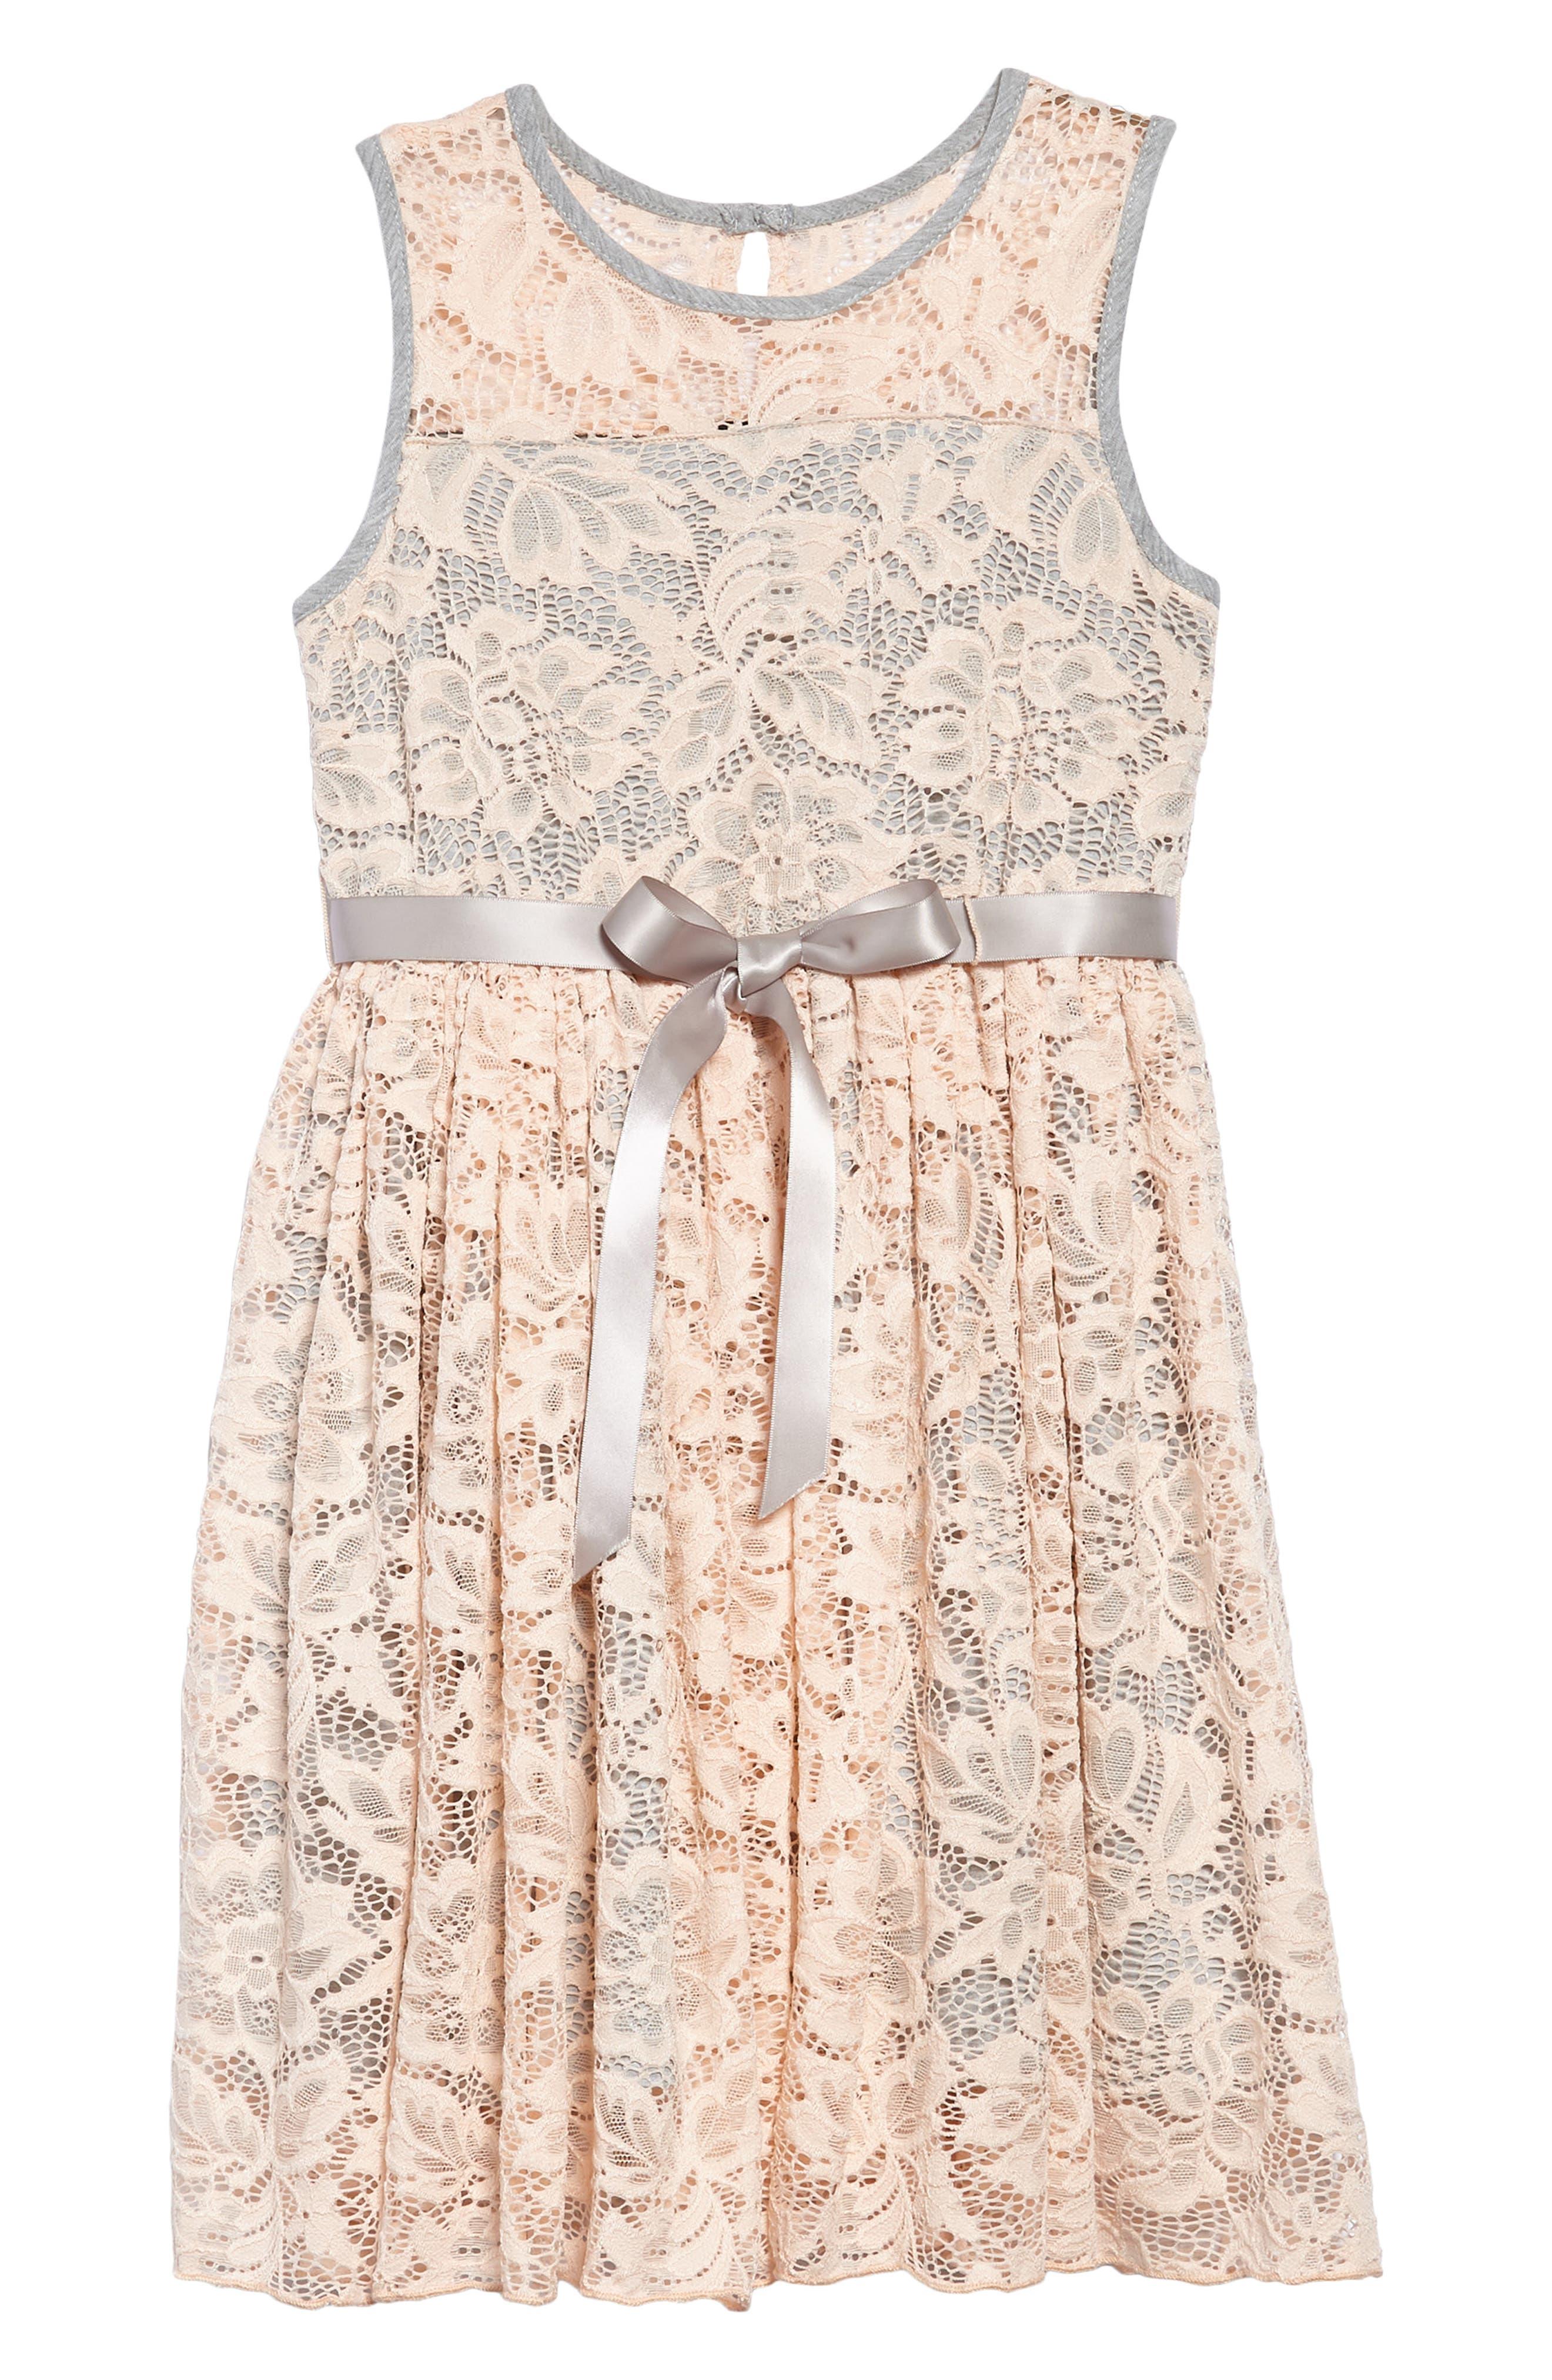 Sleeveless Floral Lace Dress,                             Main thumbnail 1, color,                             685